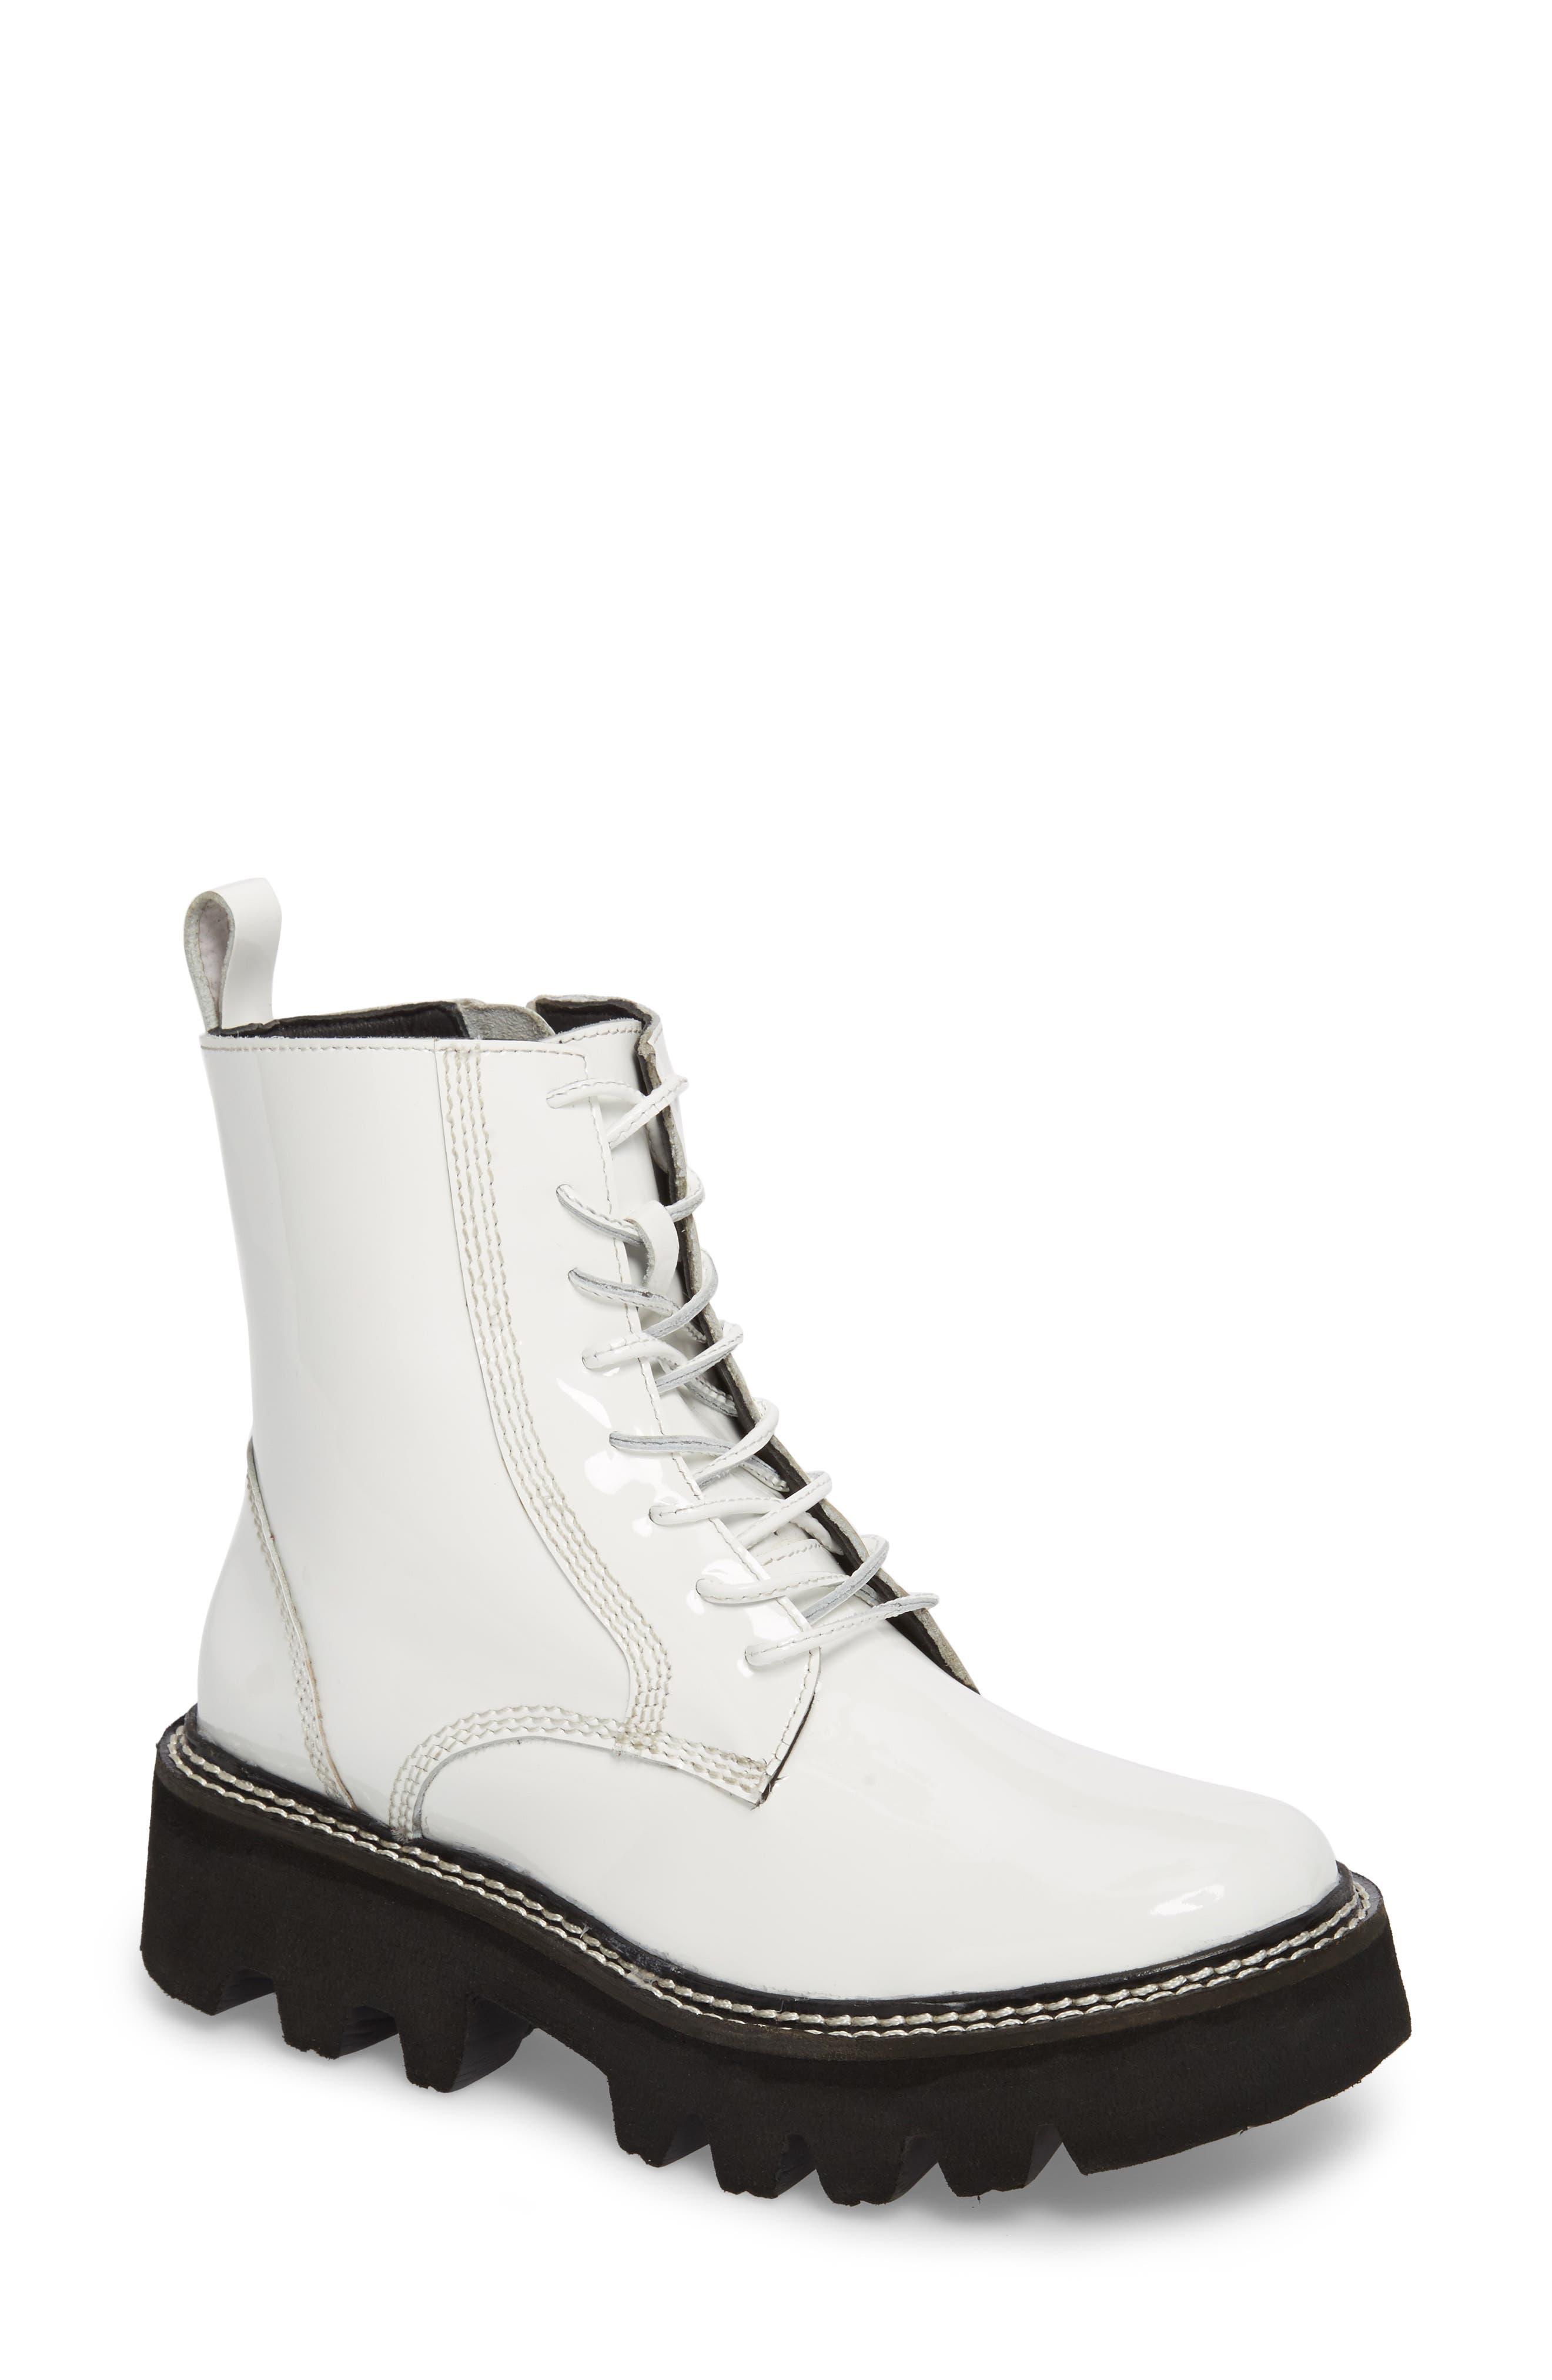 Agira Lug Boot,                             Main thumbnail 1, color,                             White Patent Leather